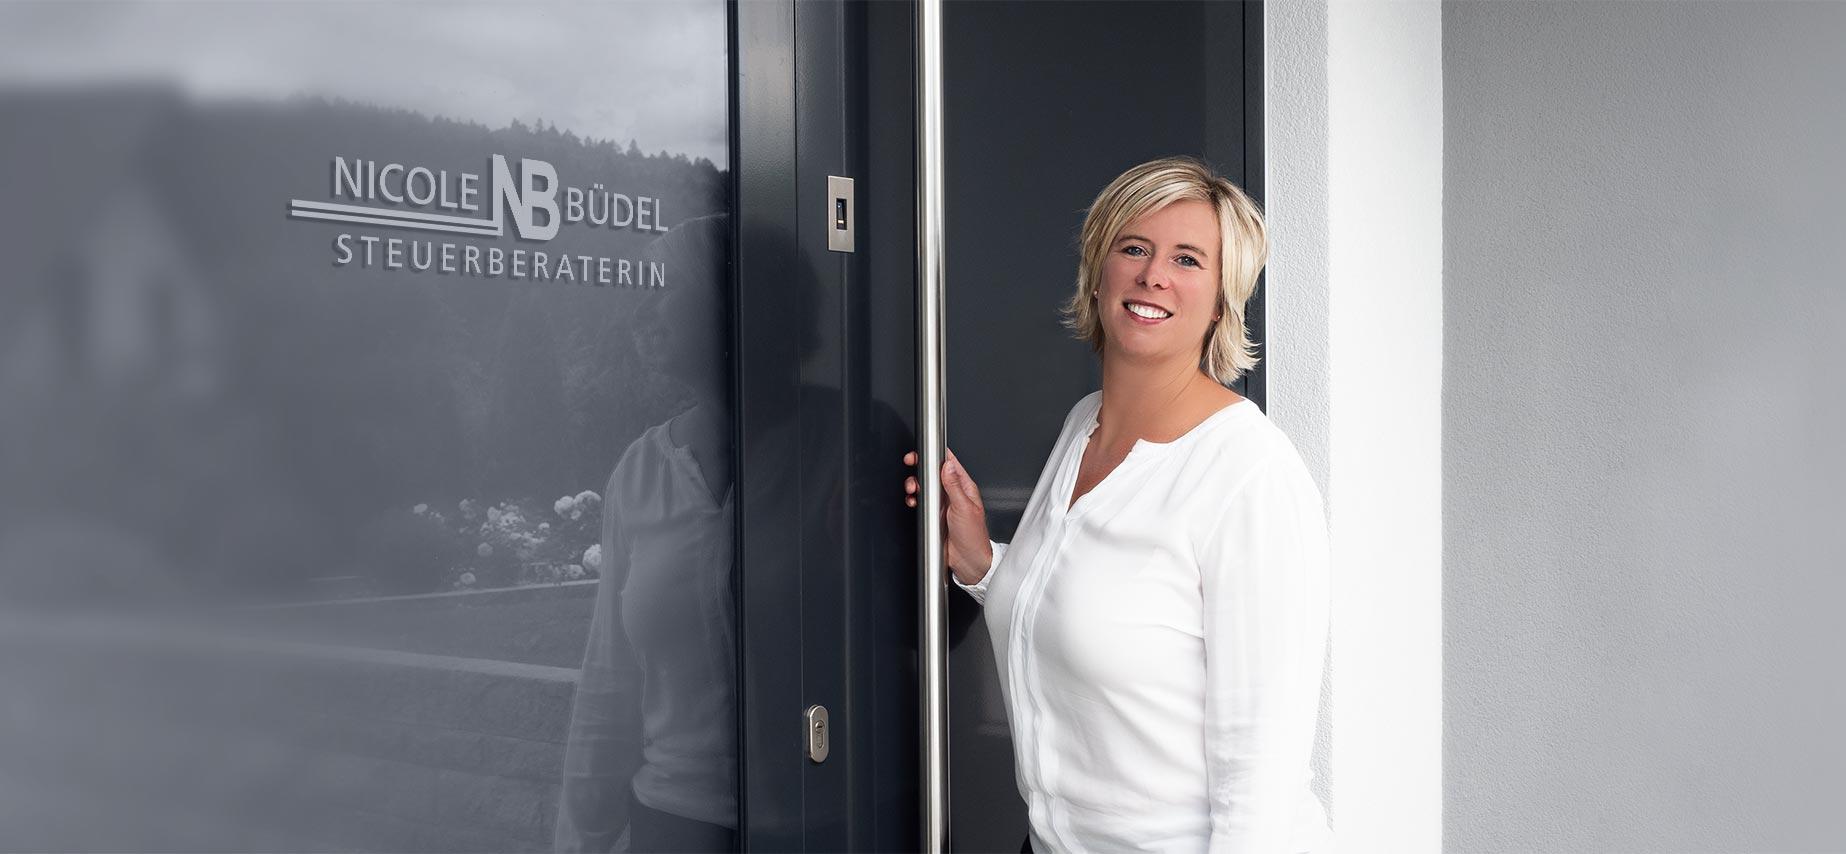 Nicole Büdel - Steuerberaterin - Teaser